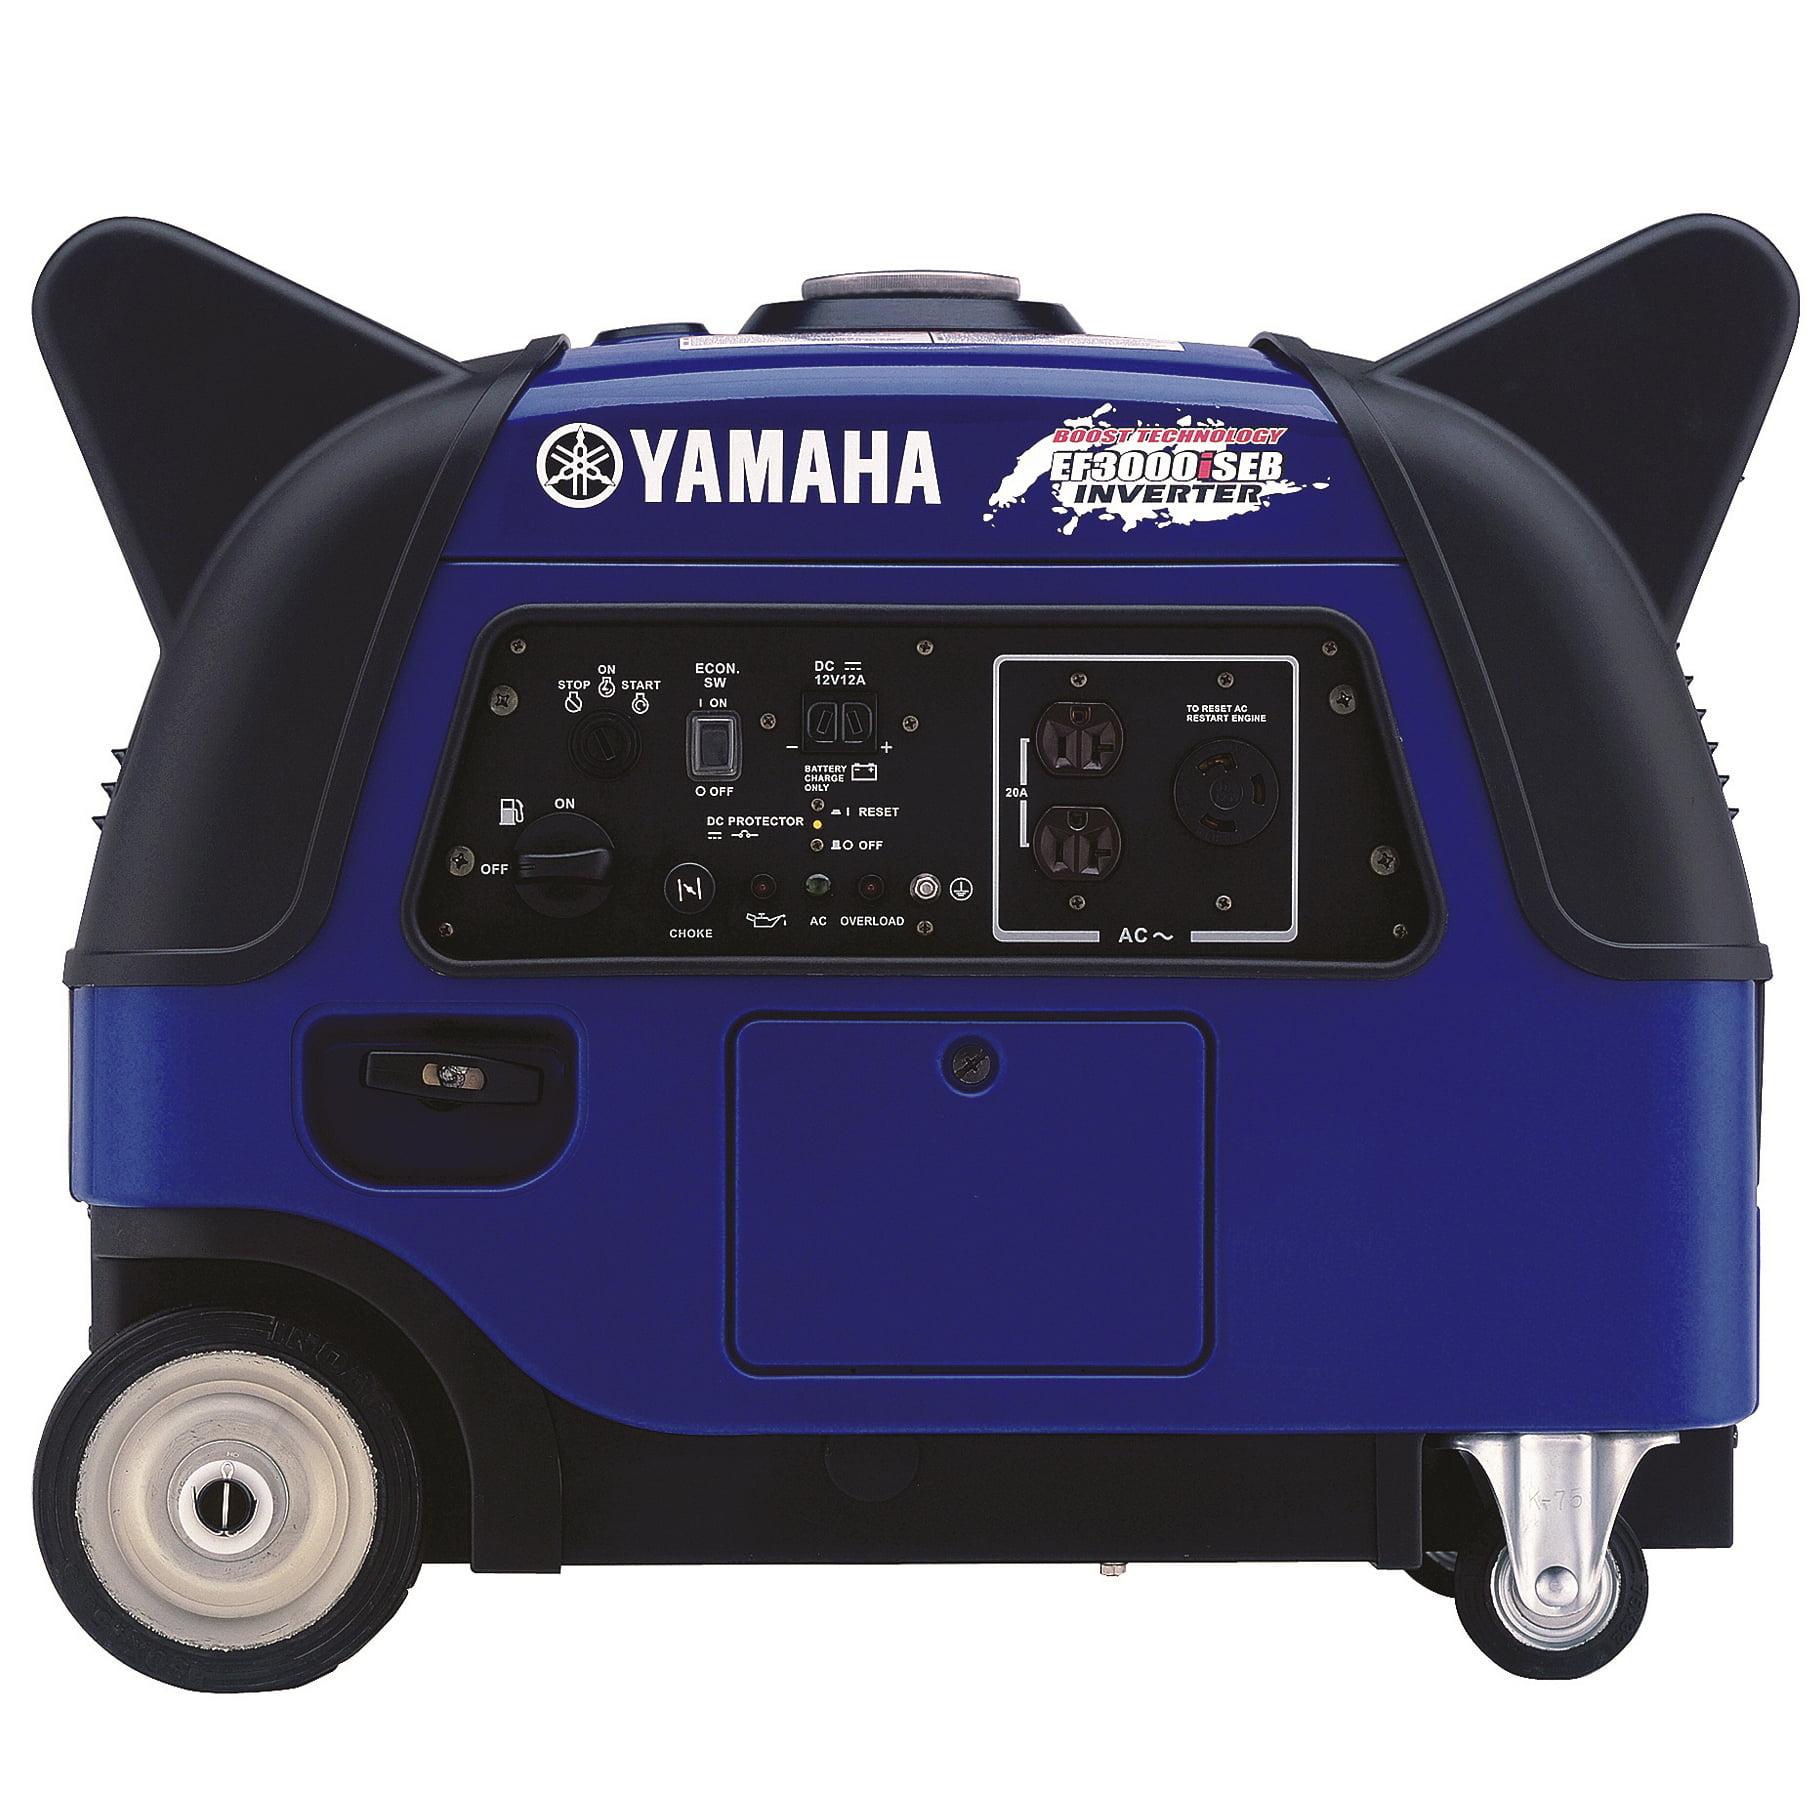 Yamaha EF3000iSEB 3 000 Watt Gas Powered Portable Inverter